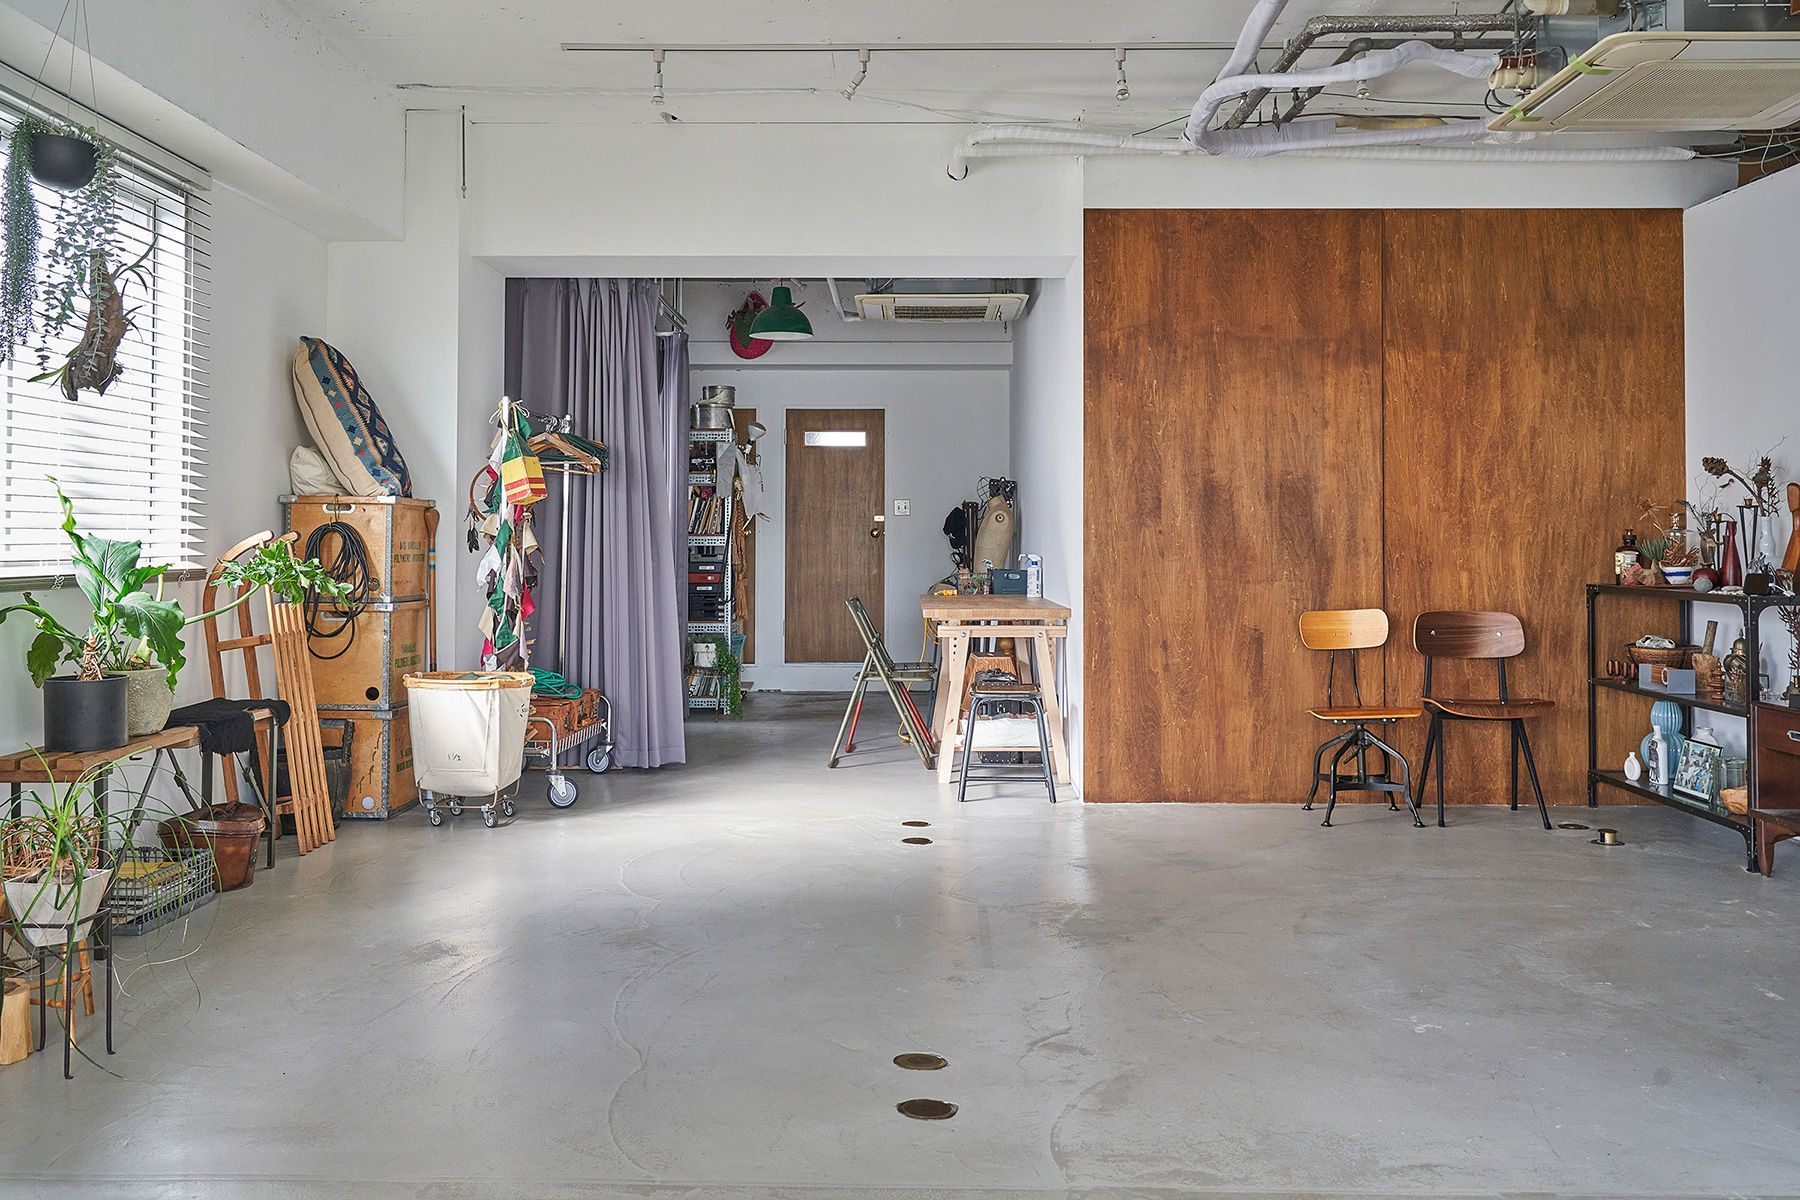 BASK STUDIO (バスク スタジオ)